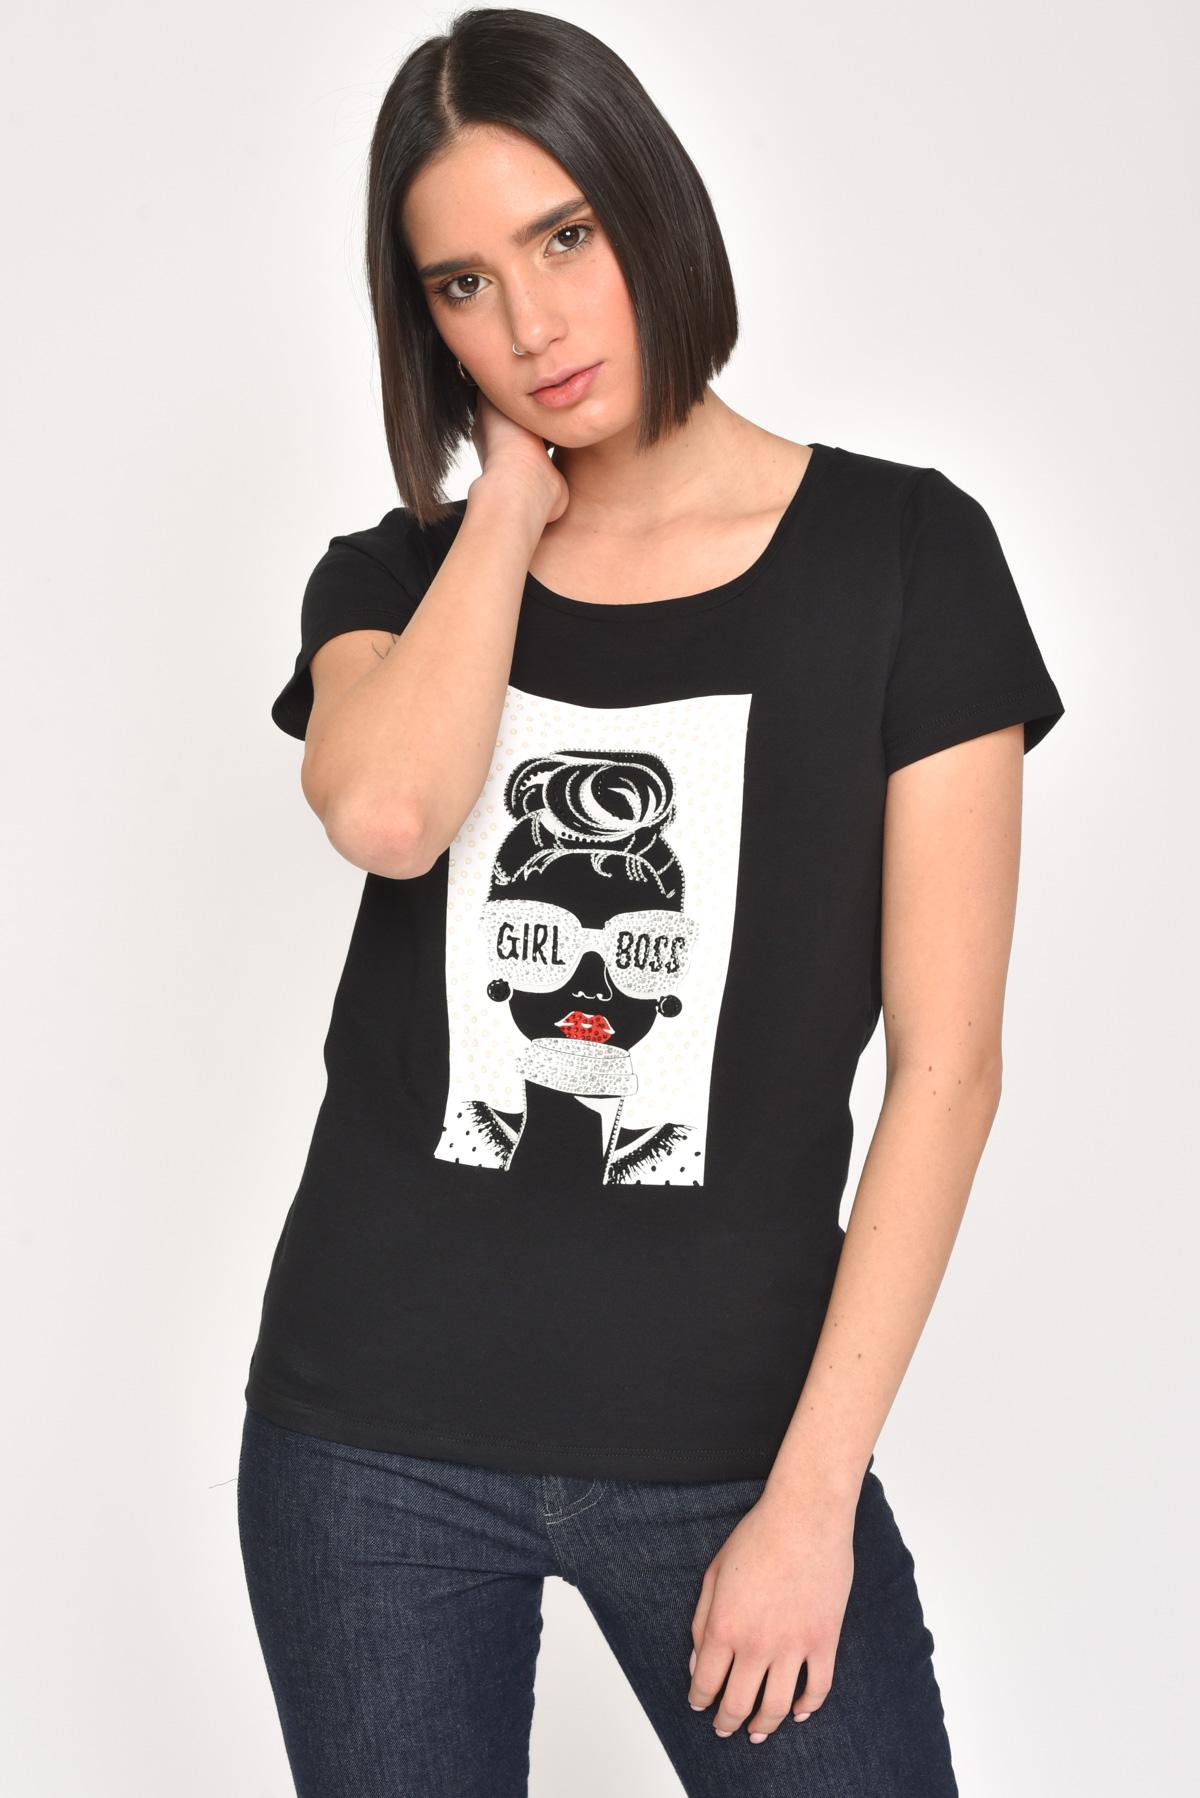 T-SHIRT GIRL BOSS IN COTONE CON STRASS for women - BLACK - Paquito Pronto Moda Shop Online